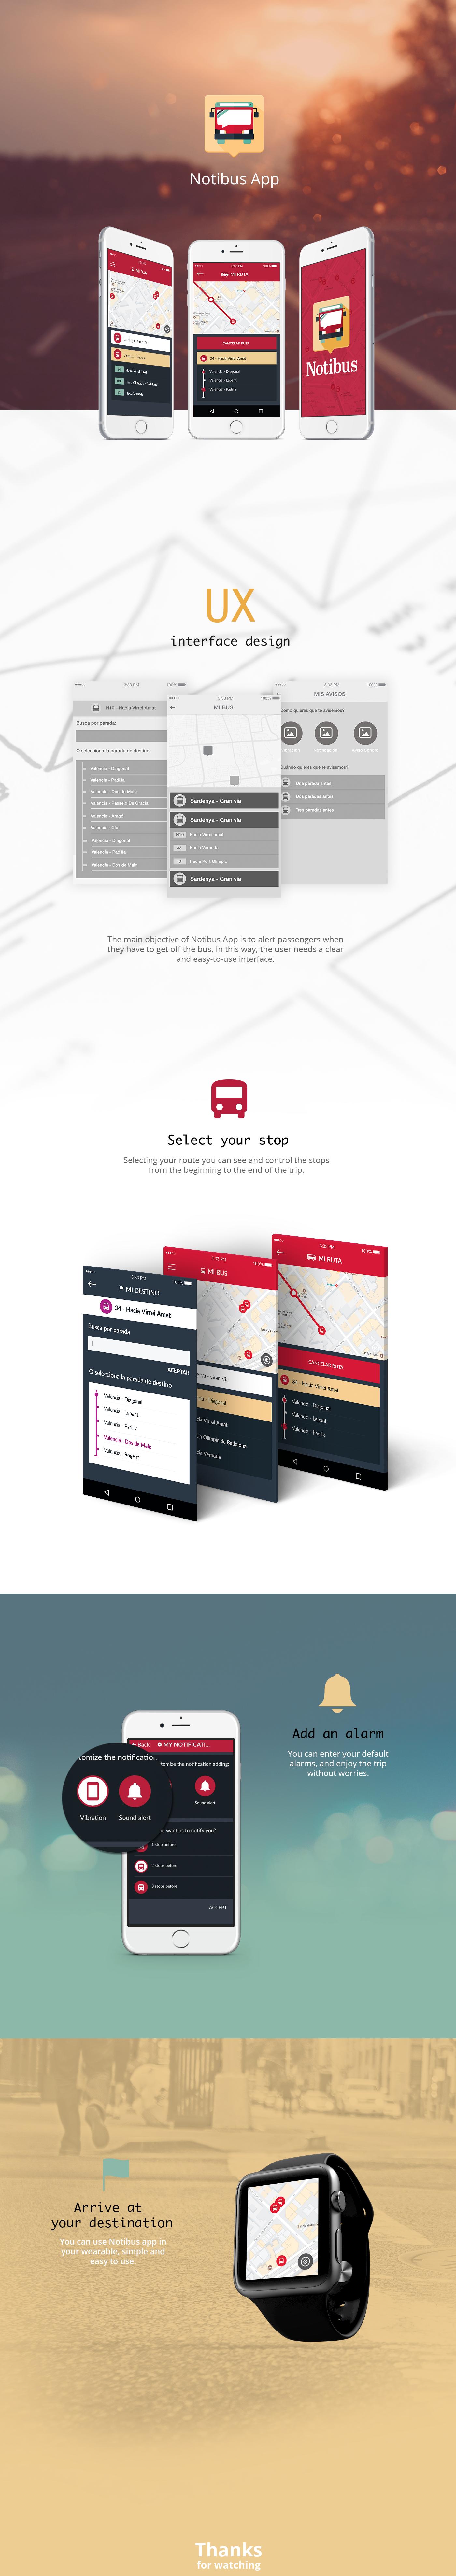 app bus app  maps UI ux iphone phone Interface